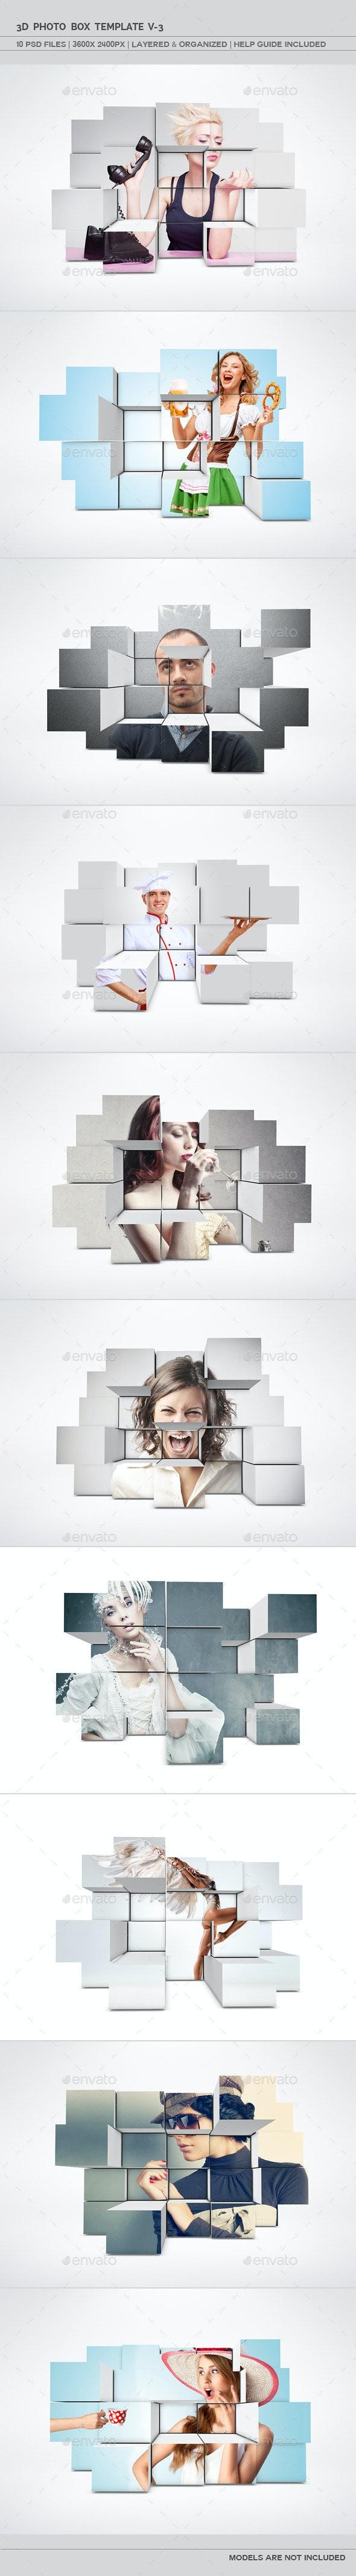 3D Photo Box Template V-3 - Miscellaneous Photo Templates